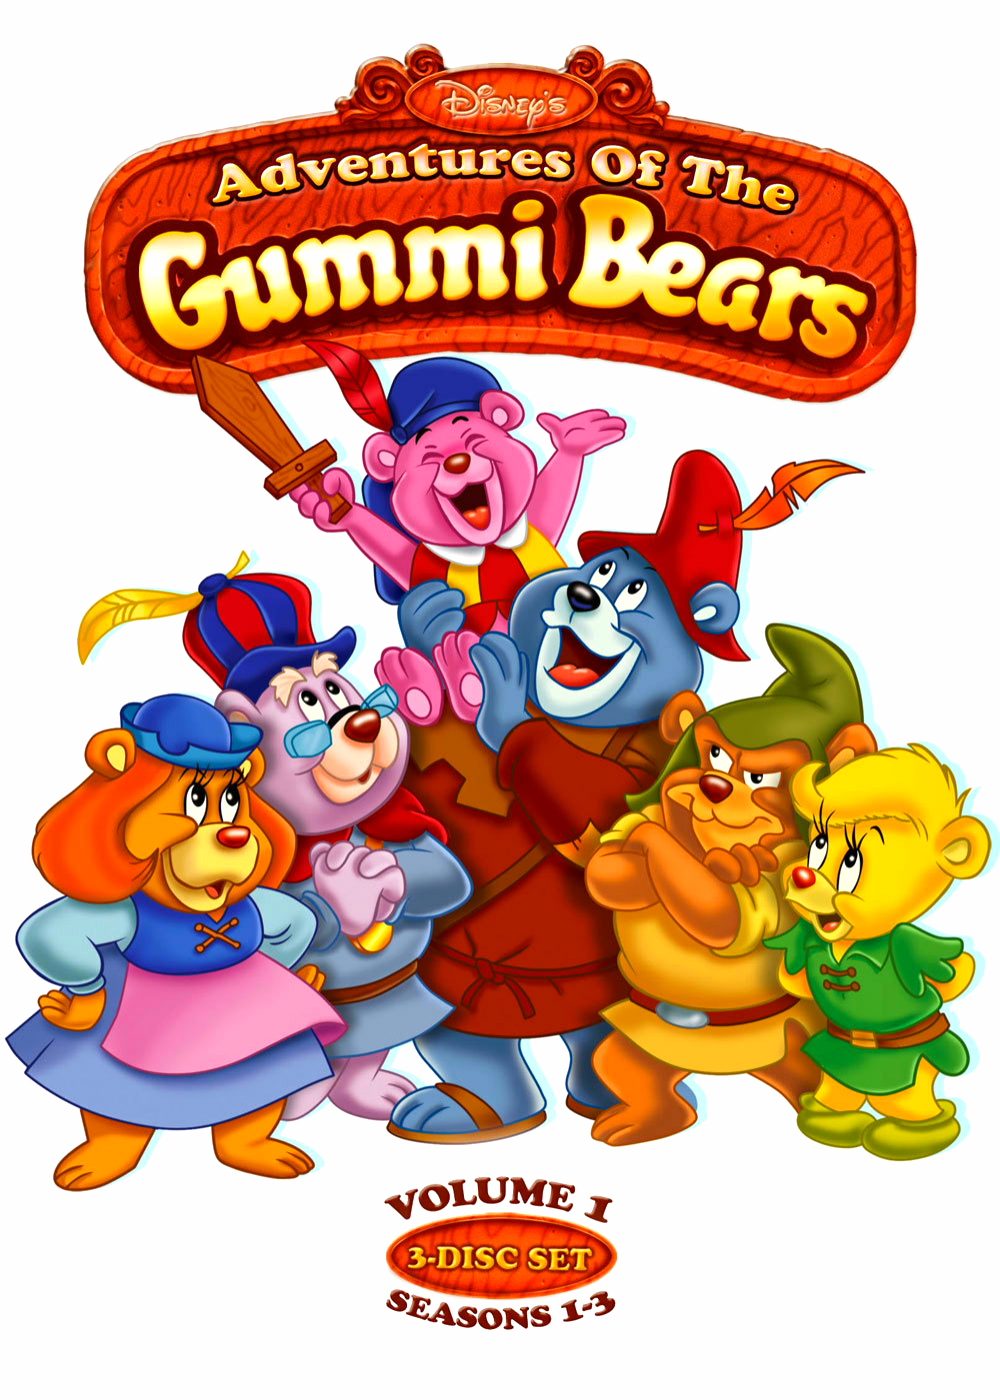 Episodlista: Bumbibjörnarna  (1985)